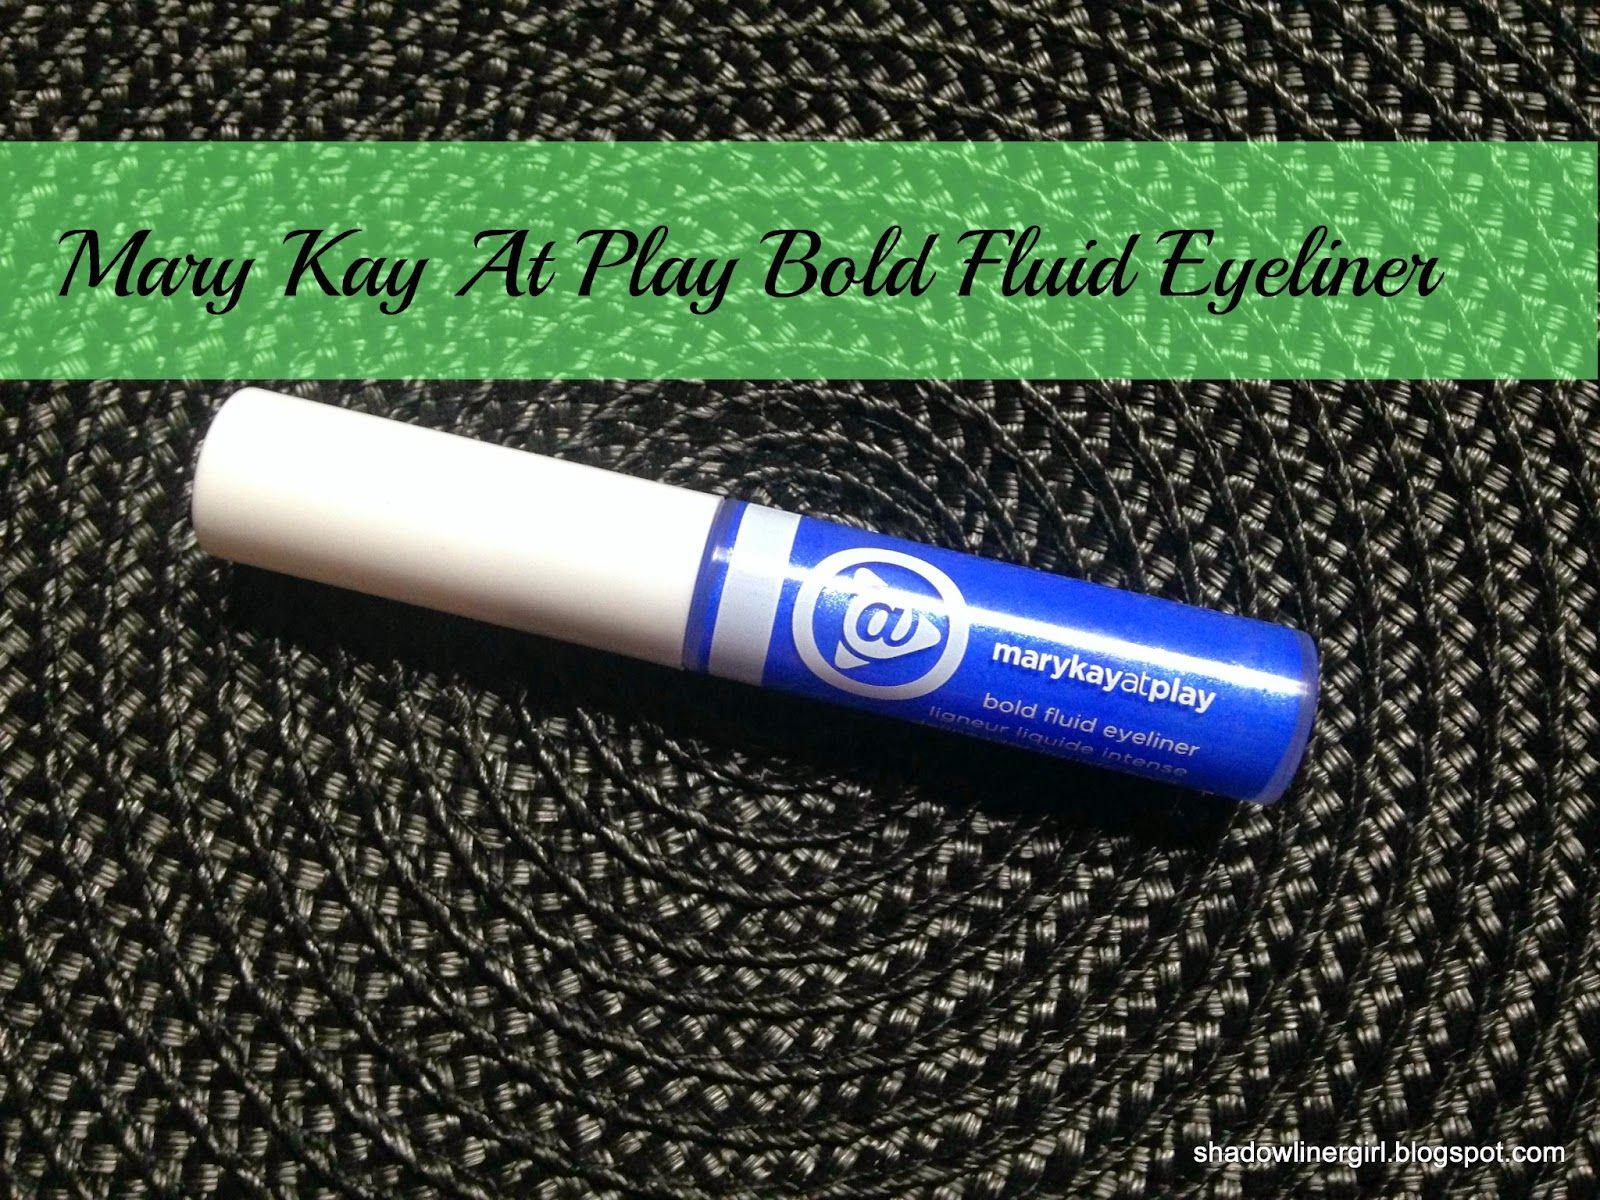 Mary Kay At Play Bold Fluid Eyeliner Review Eyeliner reviews